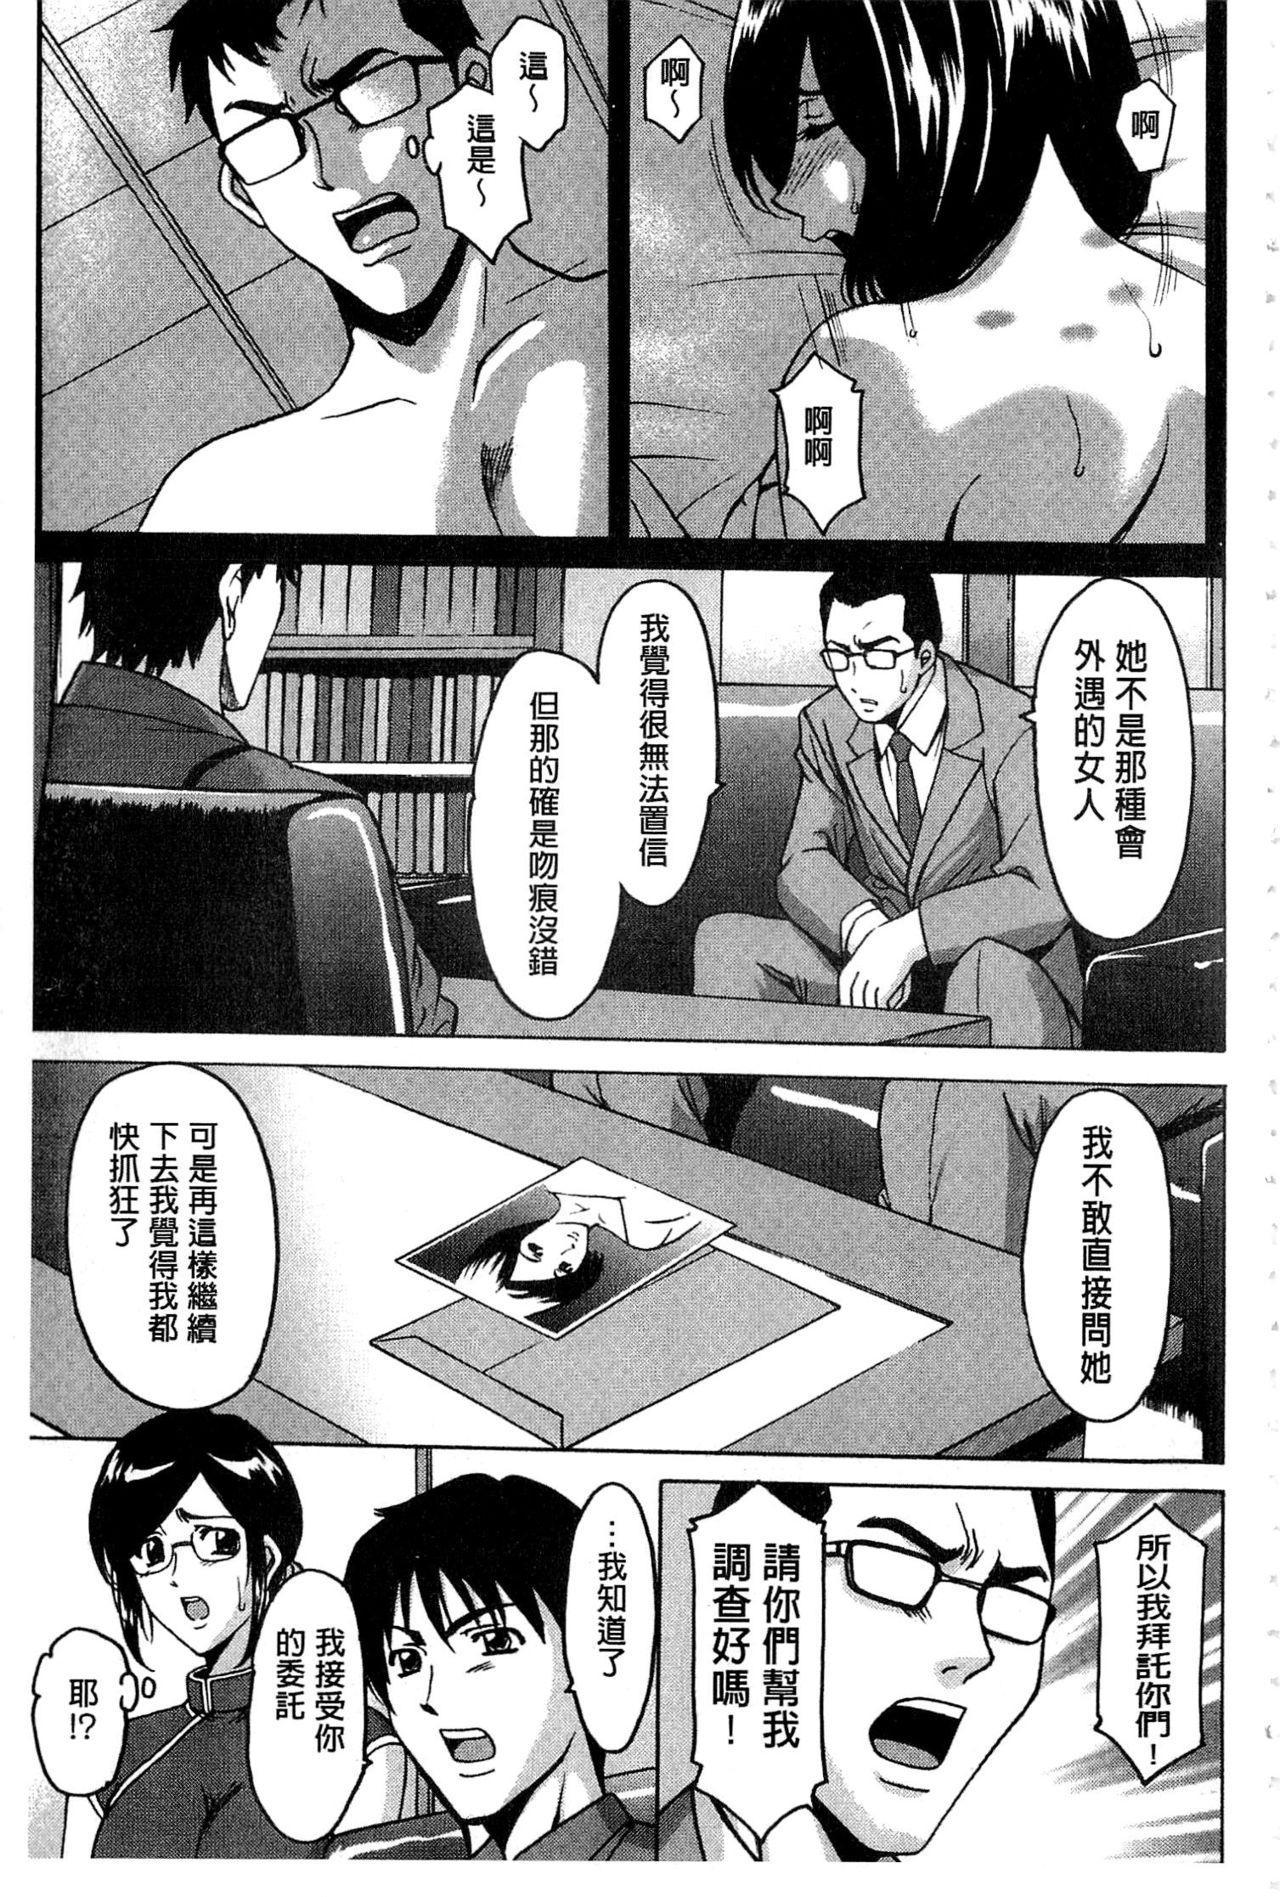 Sennyu Tsuma Satomi Kiroku | 臥底人妻里美 洗腦凌辱的記錄 上集 100